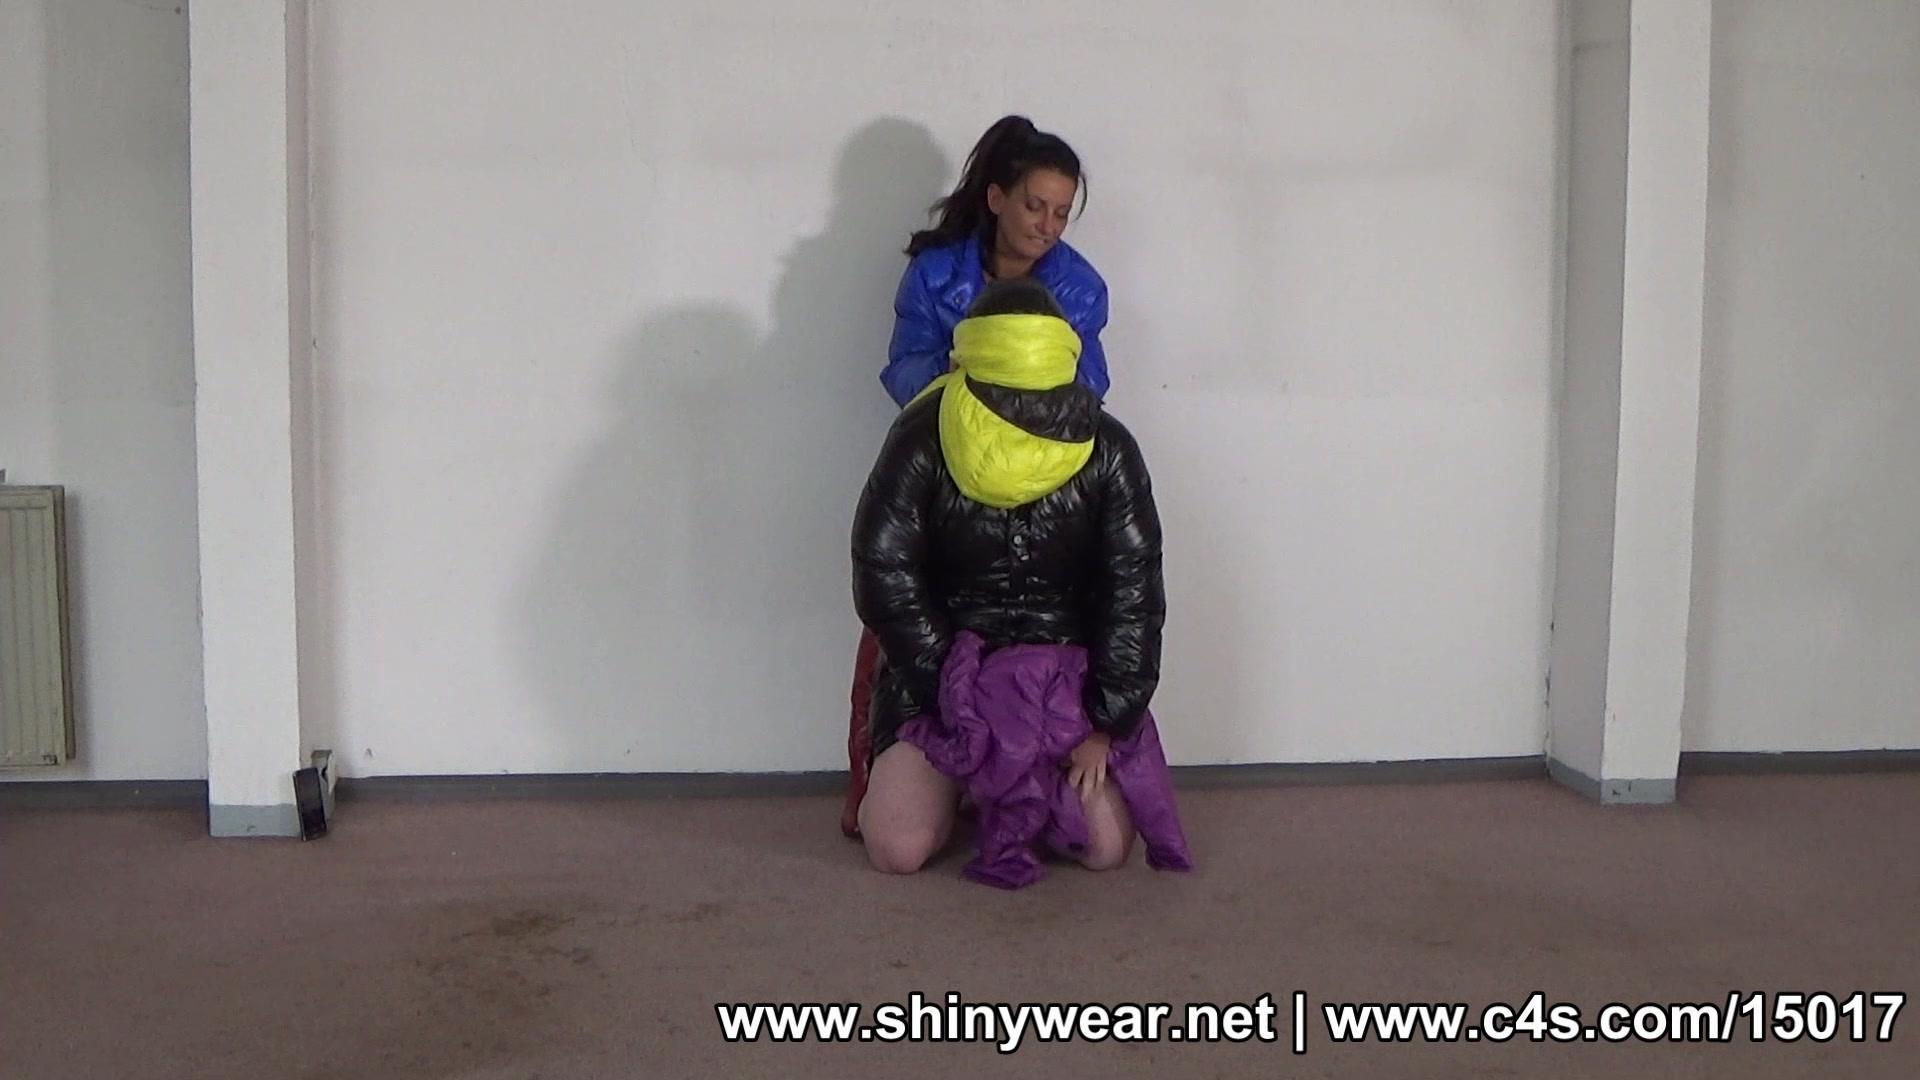 Shinywear